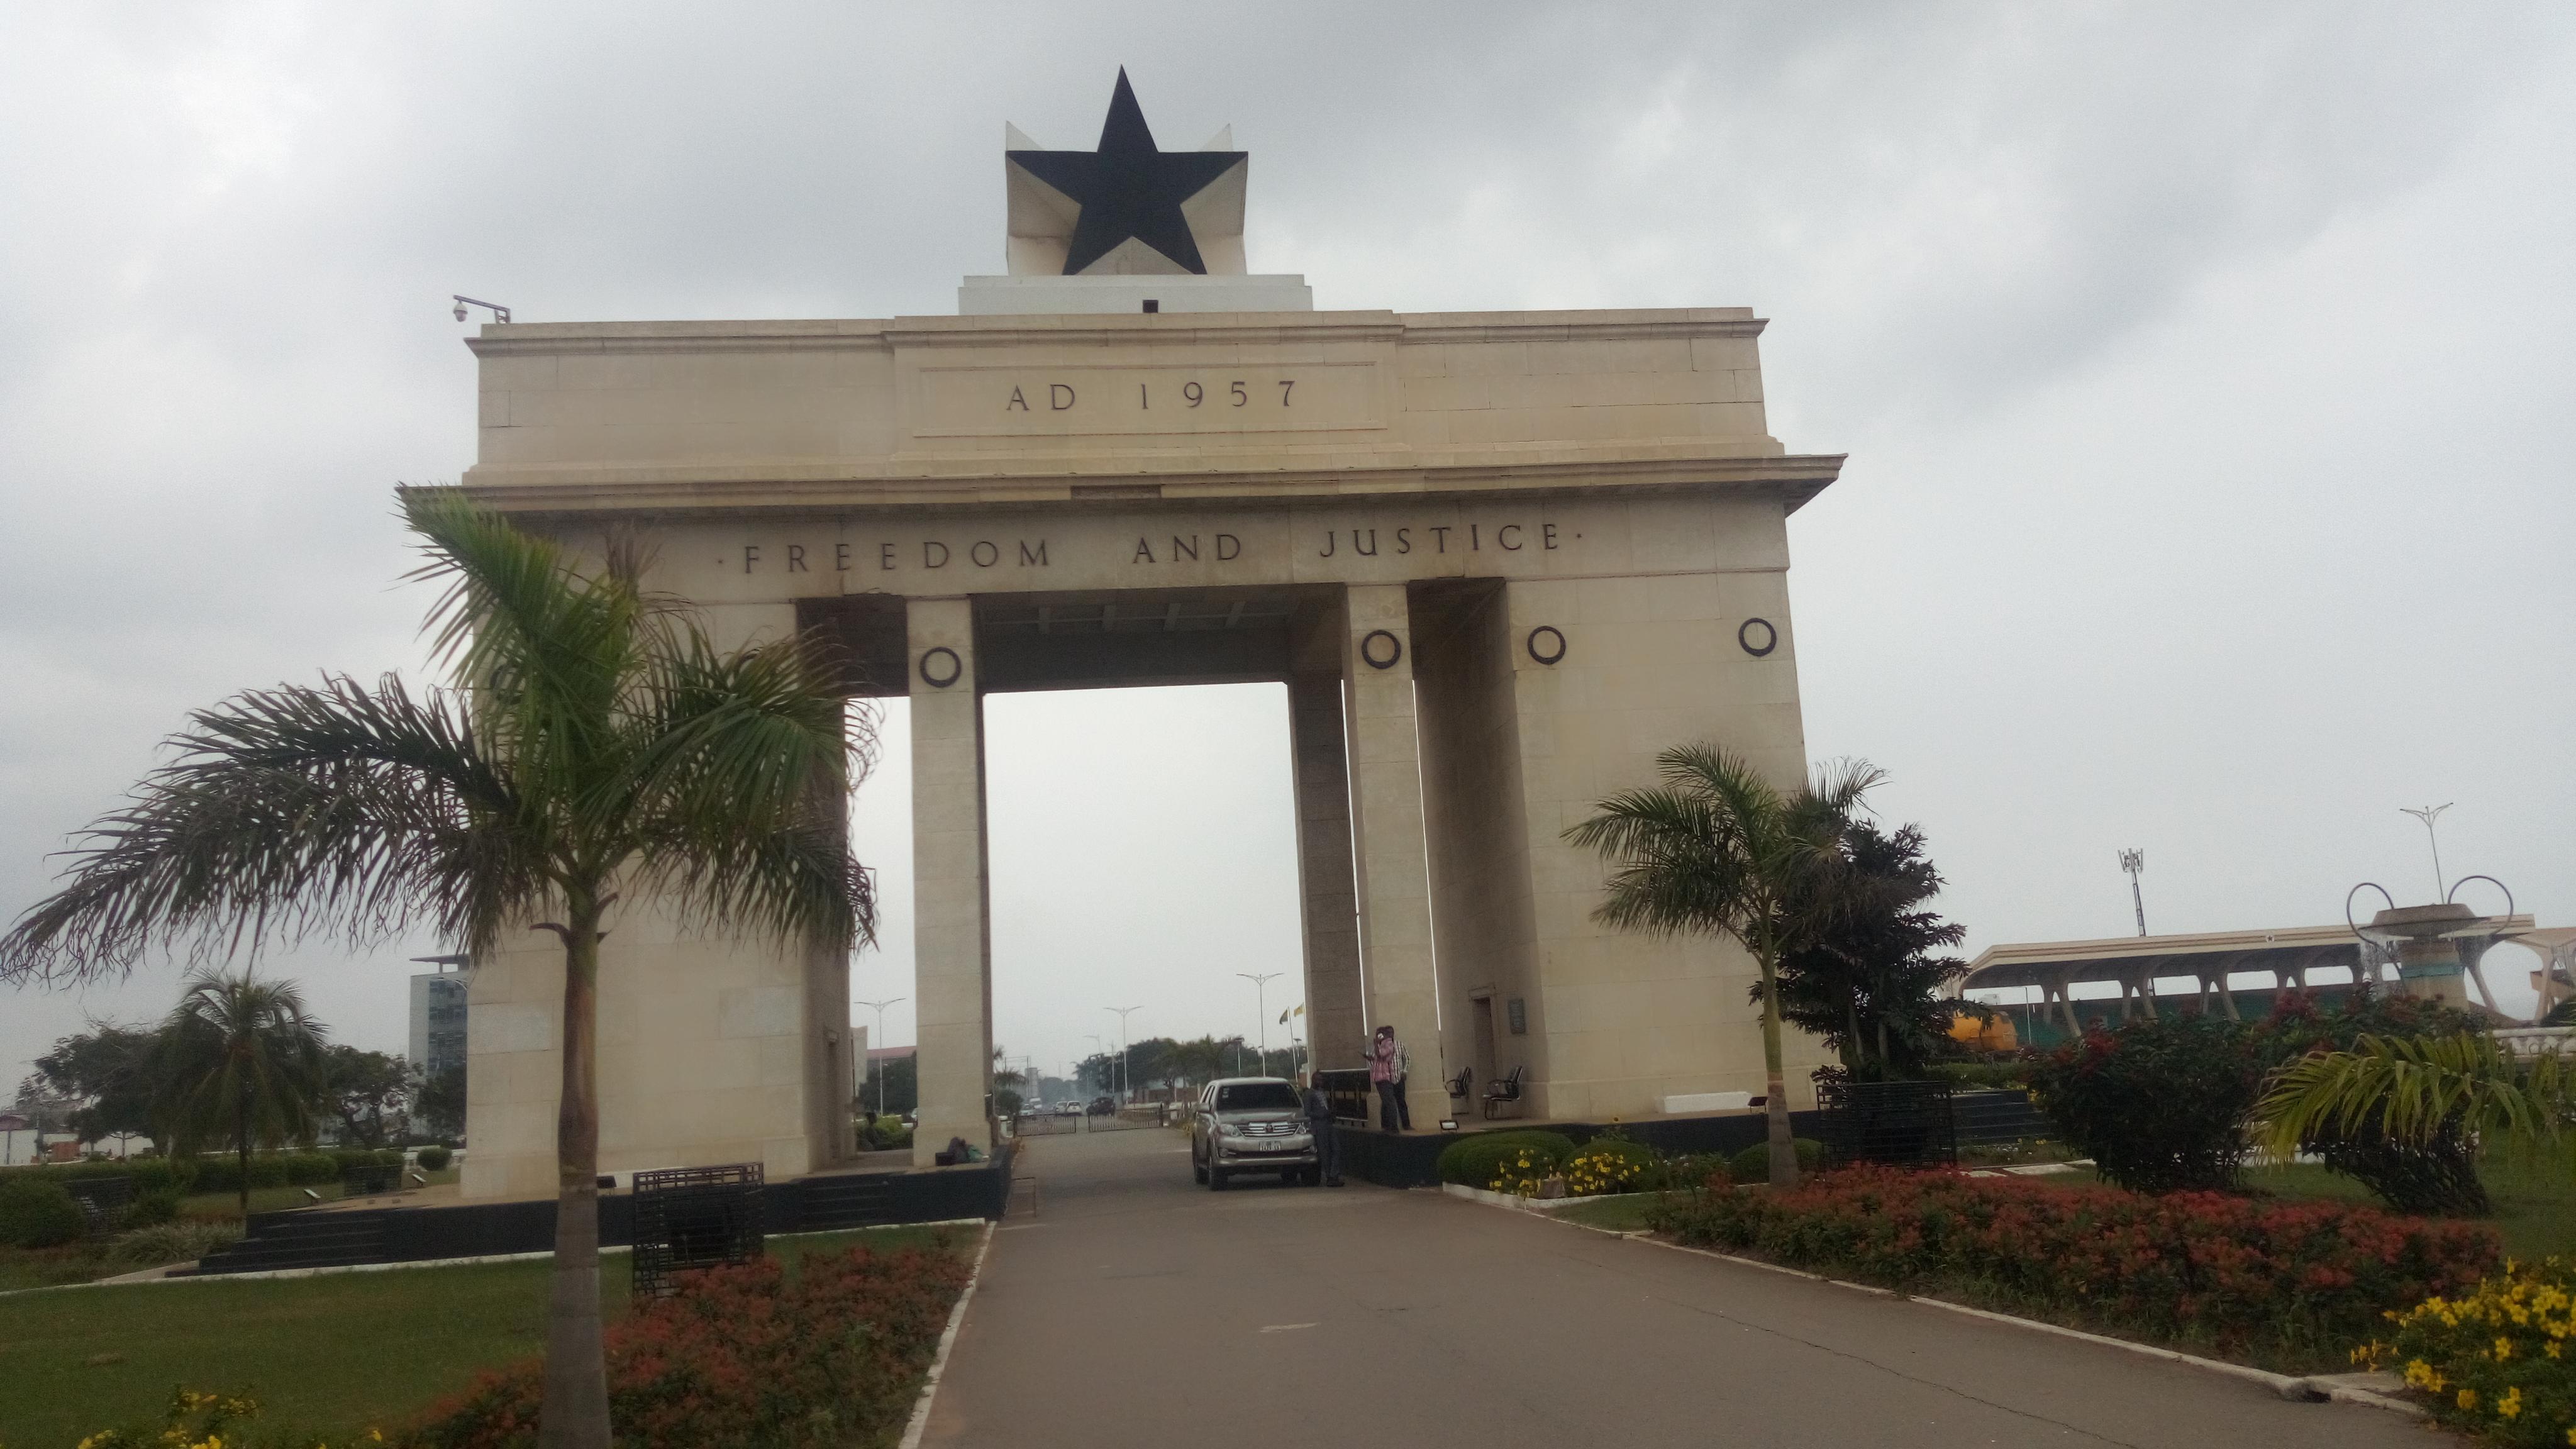 Freedom_Heritage_Park_Accra_Ghana